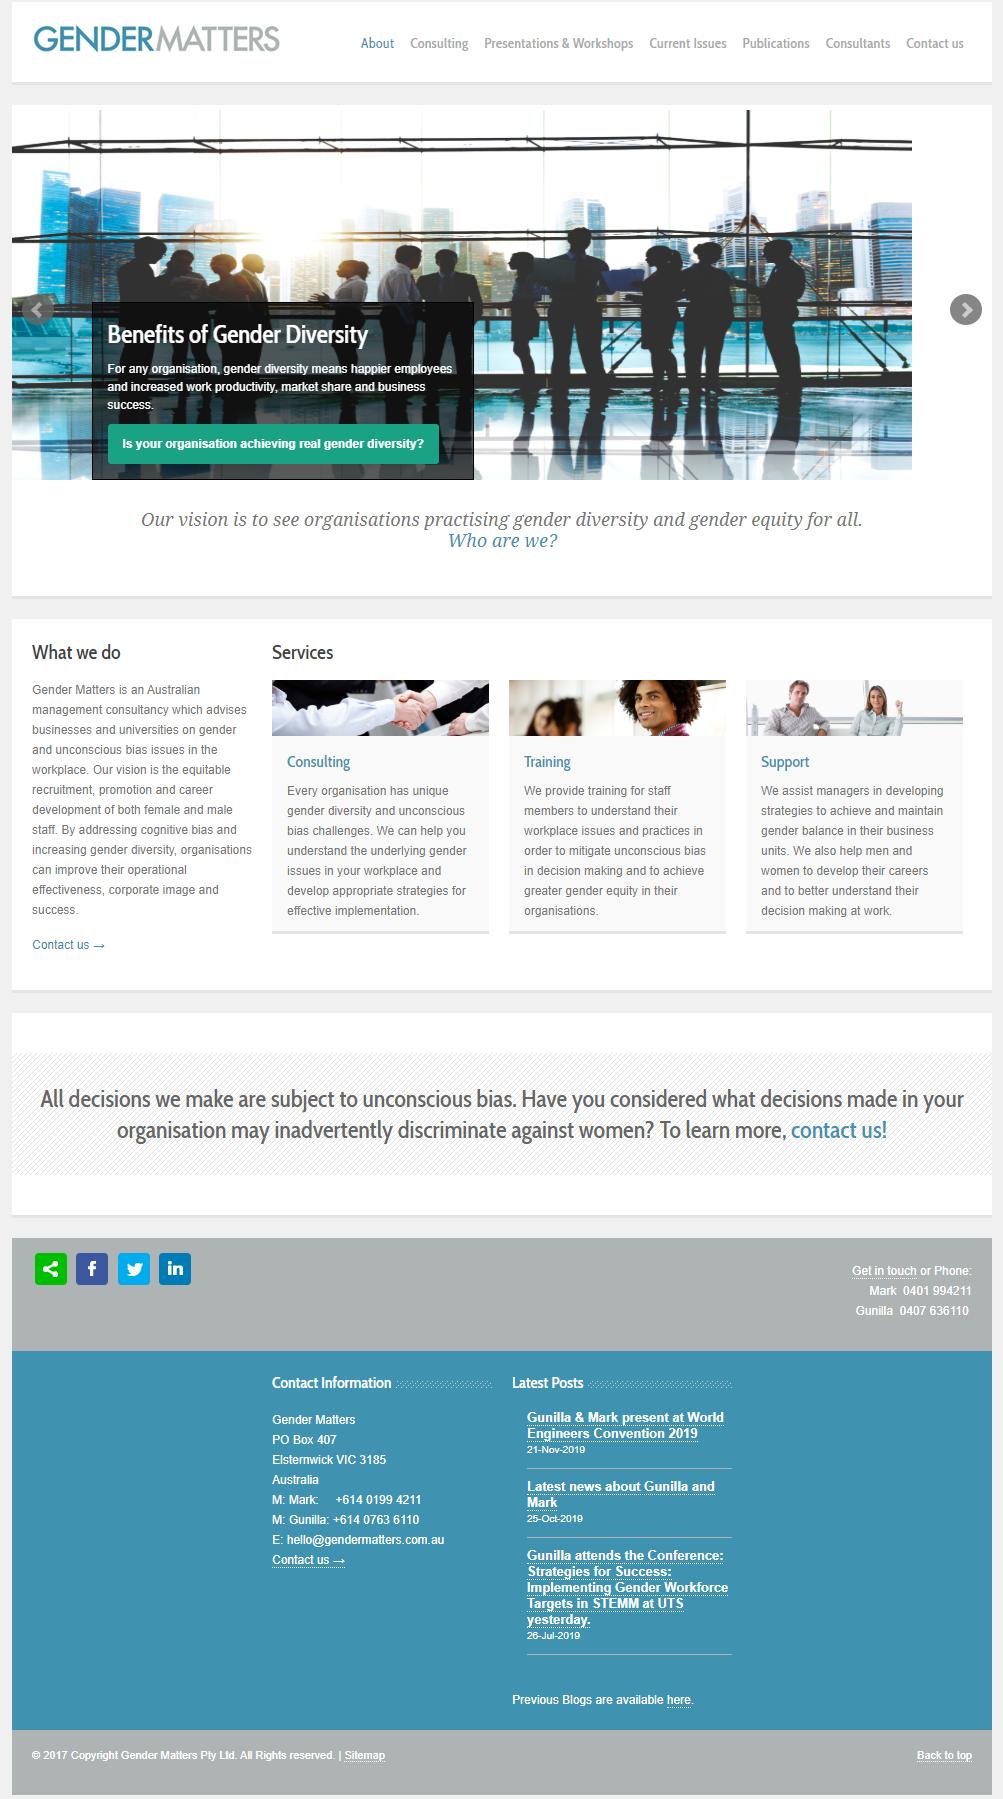 Gender Matters :: PMZ Marketing Client